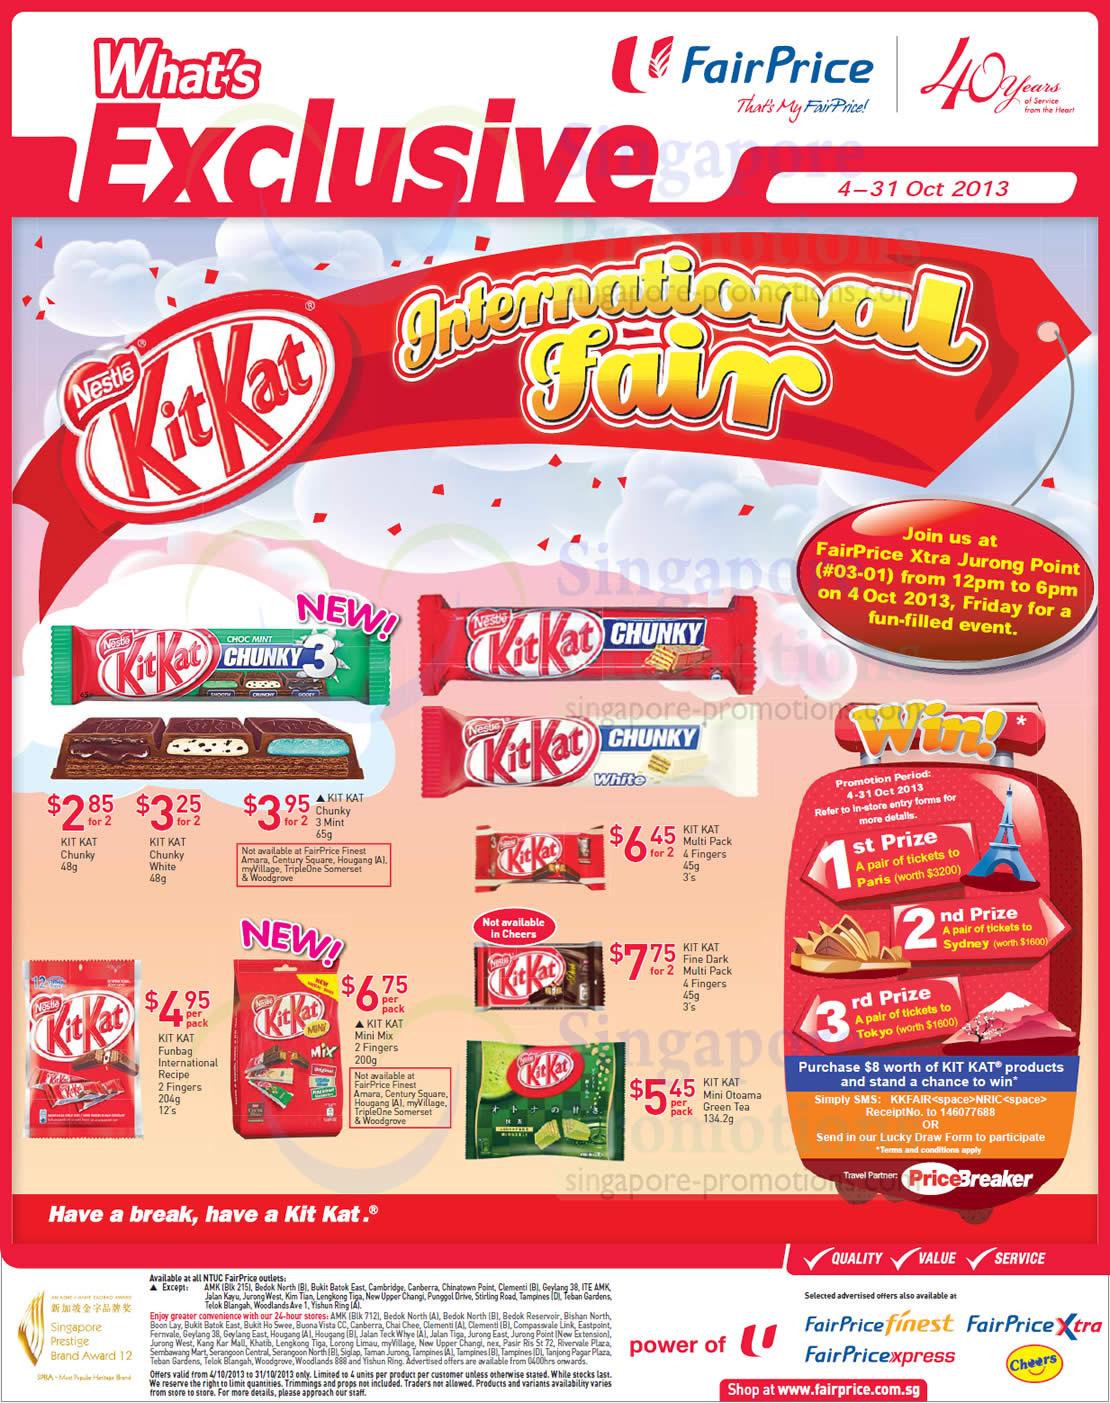 NTUC Fairprice Groceries, Kit Kat, Philips LED Lightings ...